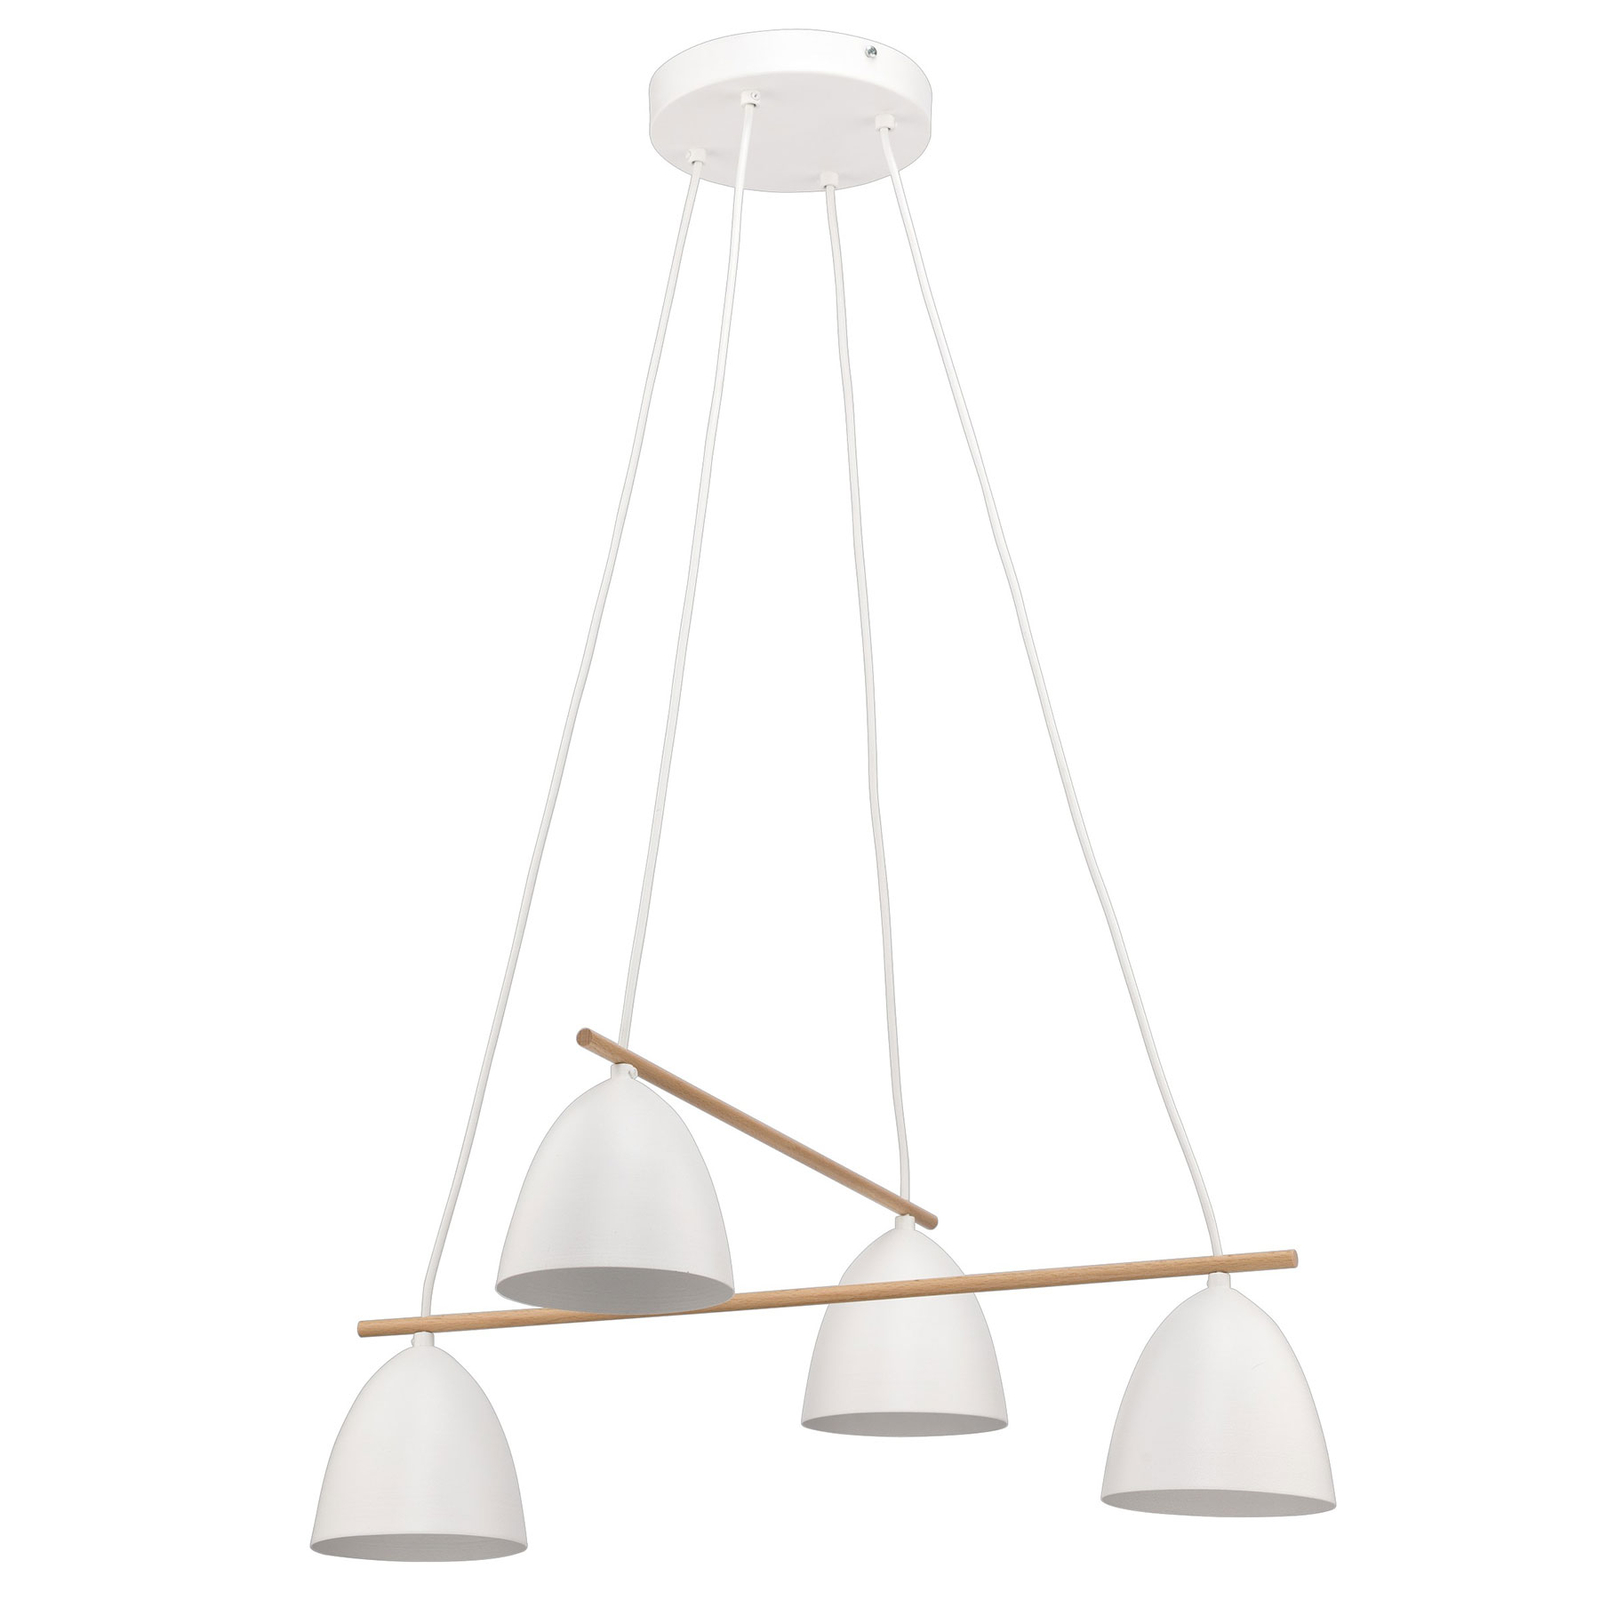 Lampa wisząca Aida, 4-punktowa, biała